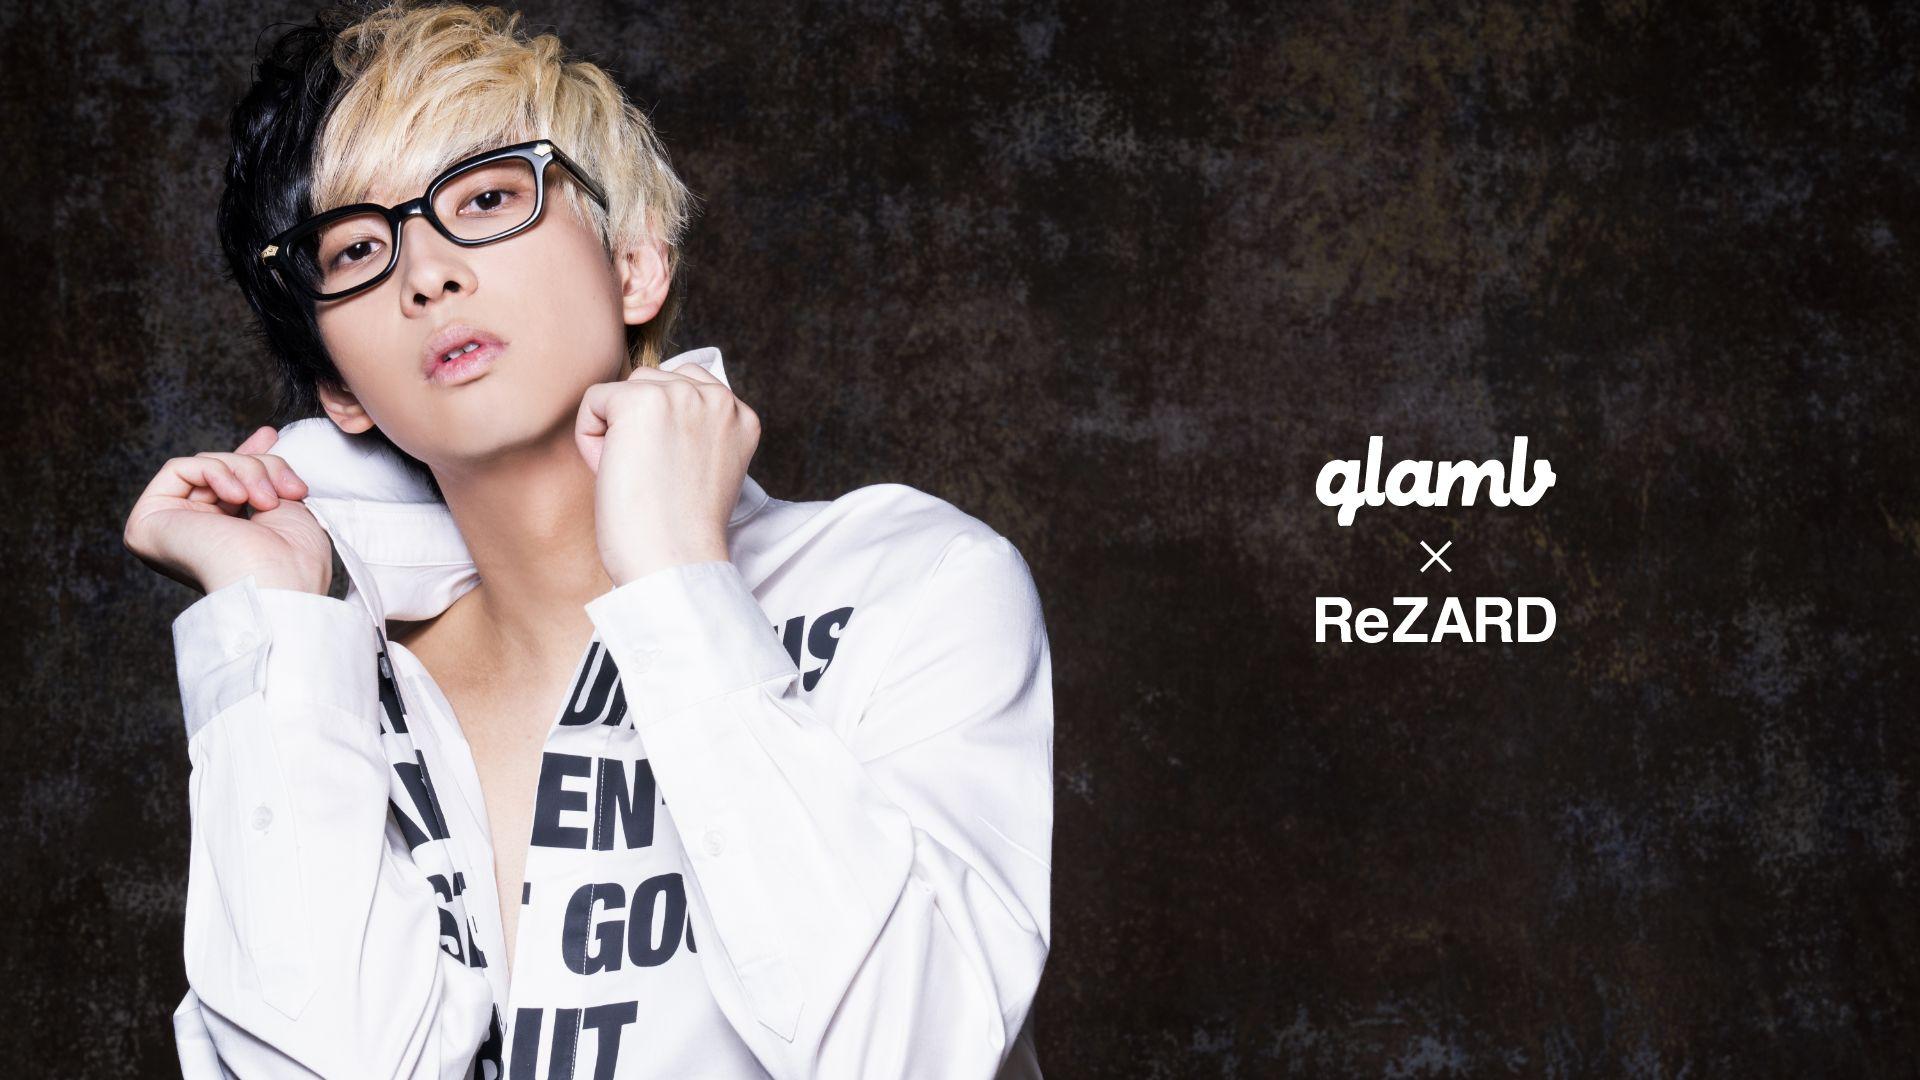 glamb x ReZARD